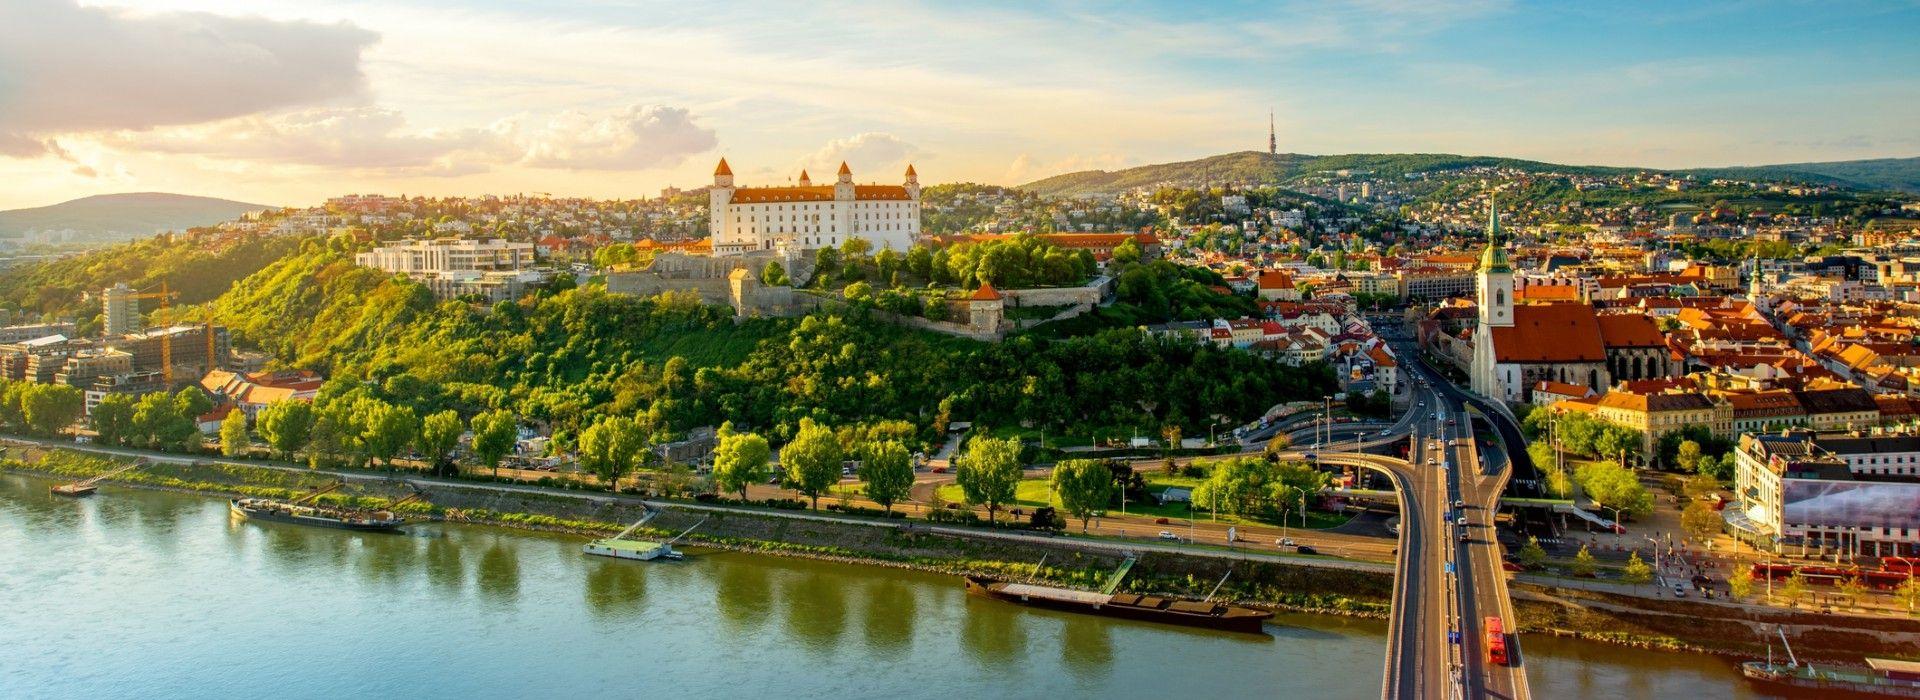 Slovakia Tours and Trips in Slovakia